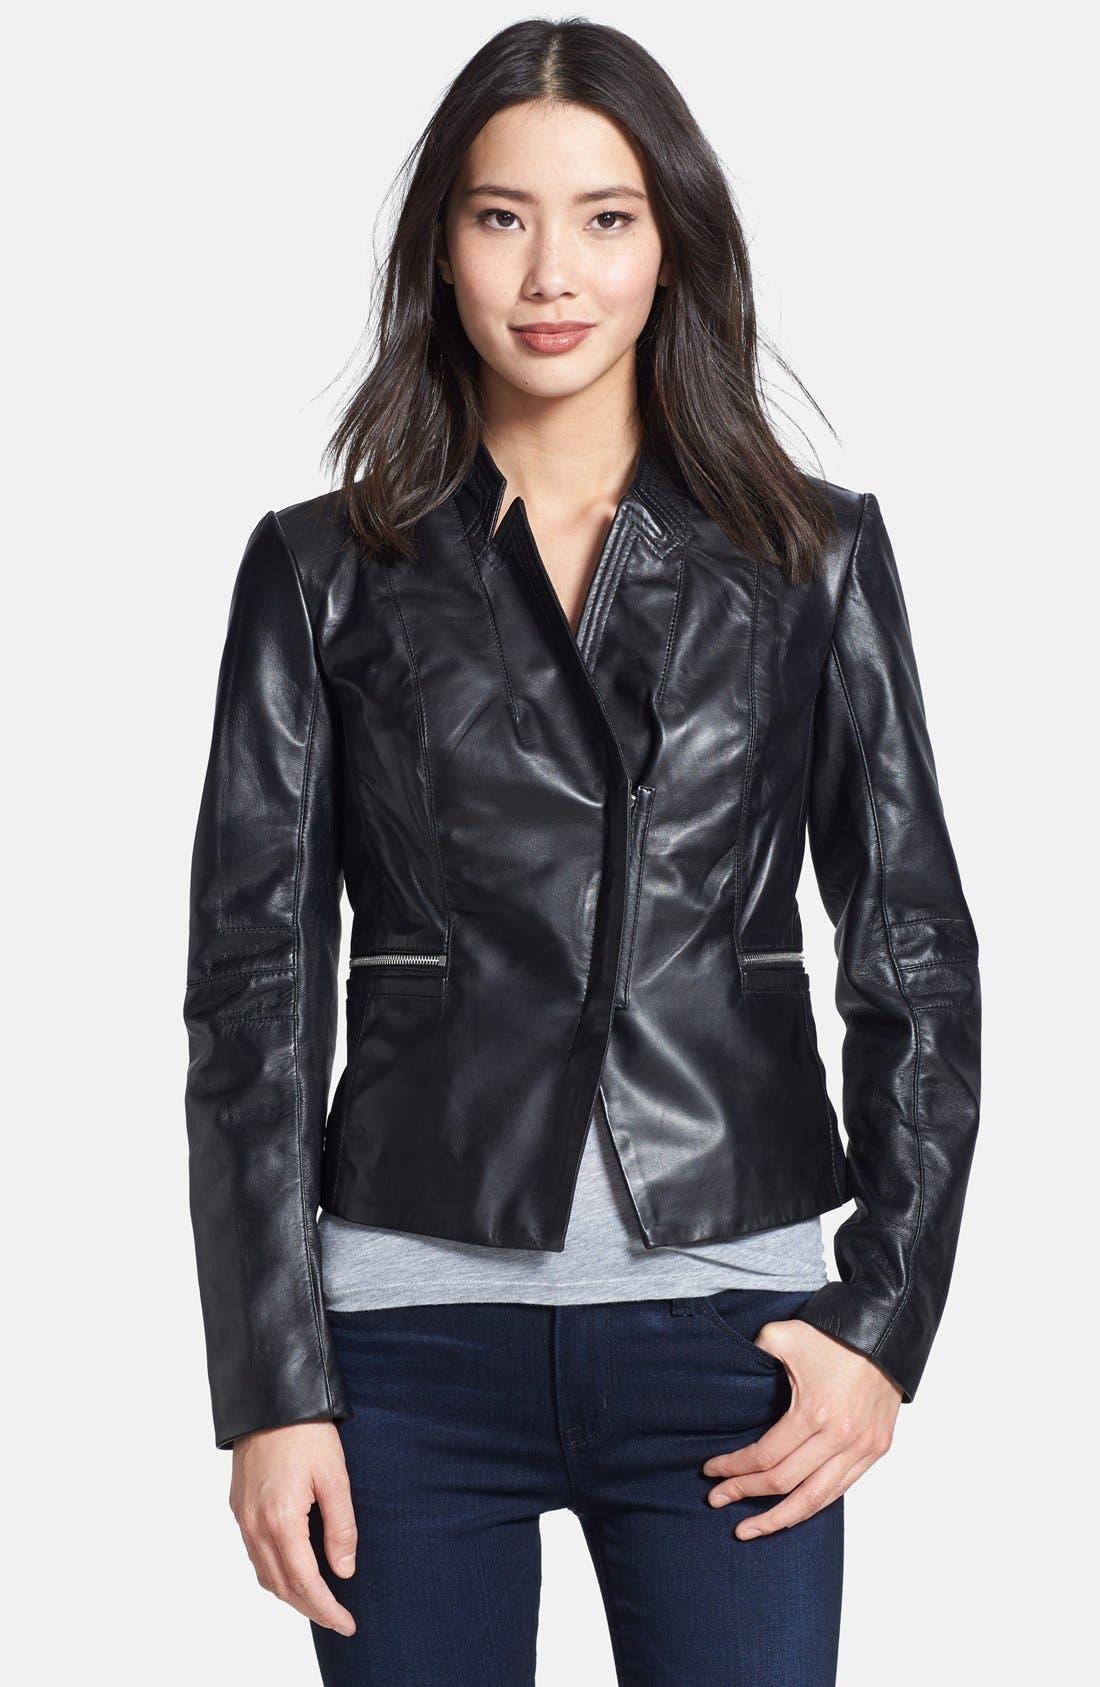 Main Image - Laundry by Shelli Segal Peplum Back Cutaway Leather Jacket